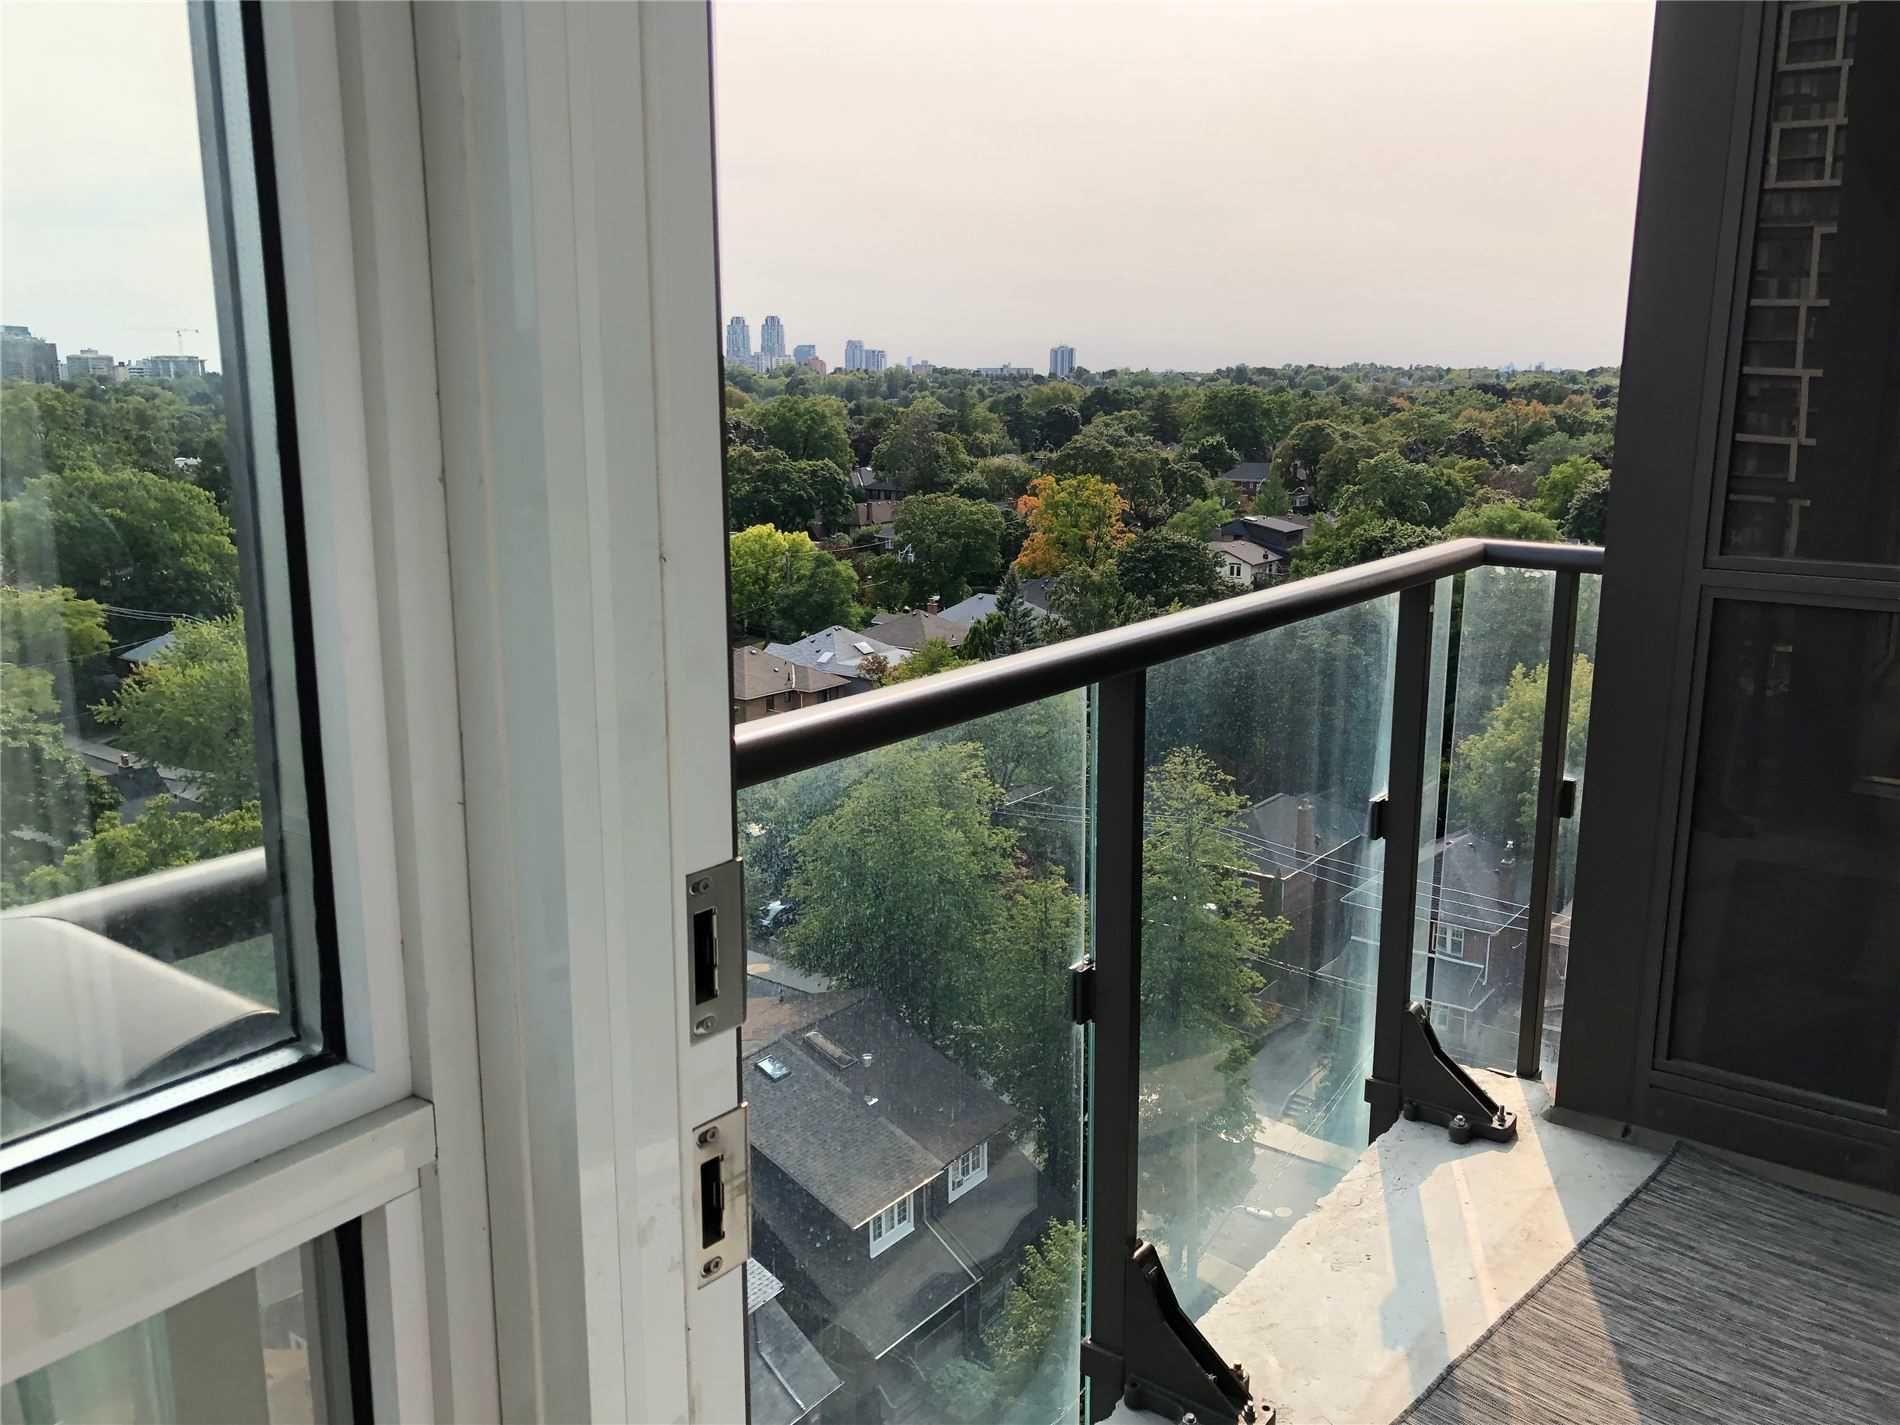 Photo 12: Photos: 1103 60 Berwick Avenue in Toronto: Yonge-Eglinton Condo for lease (Toronto C03)  : MLS®# C4822743